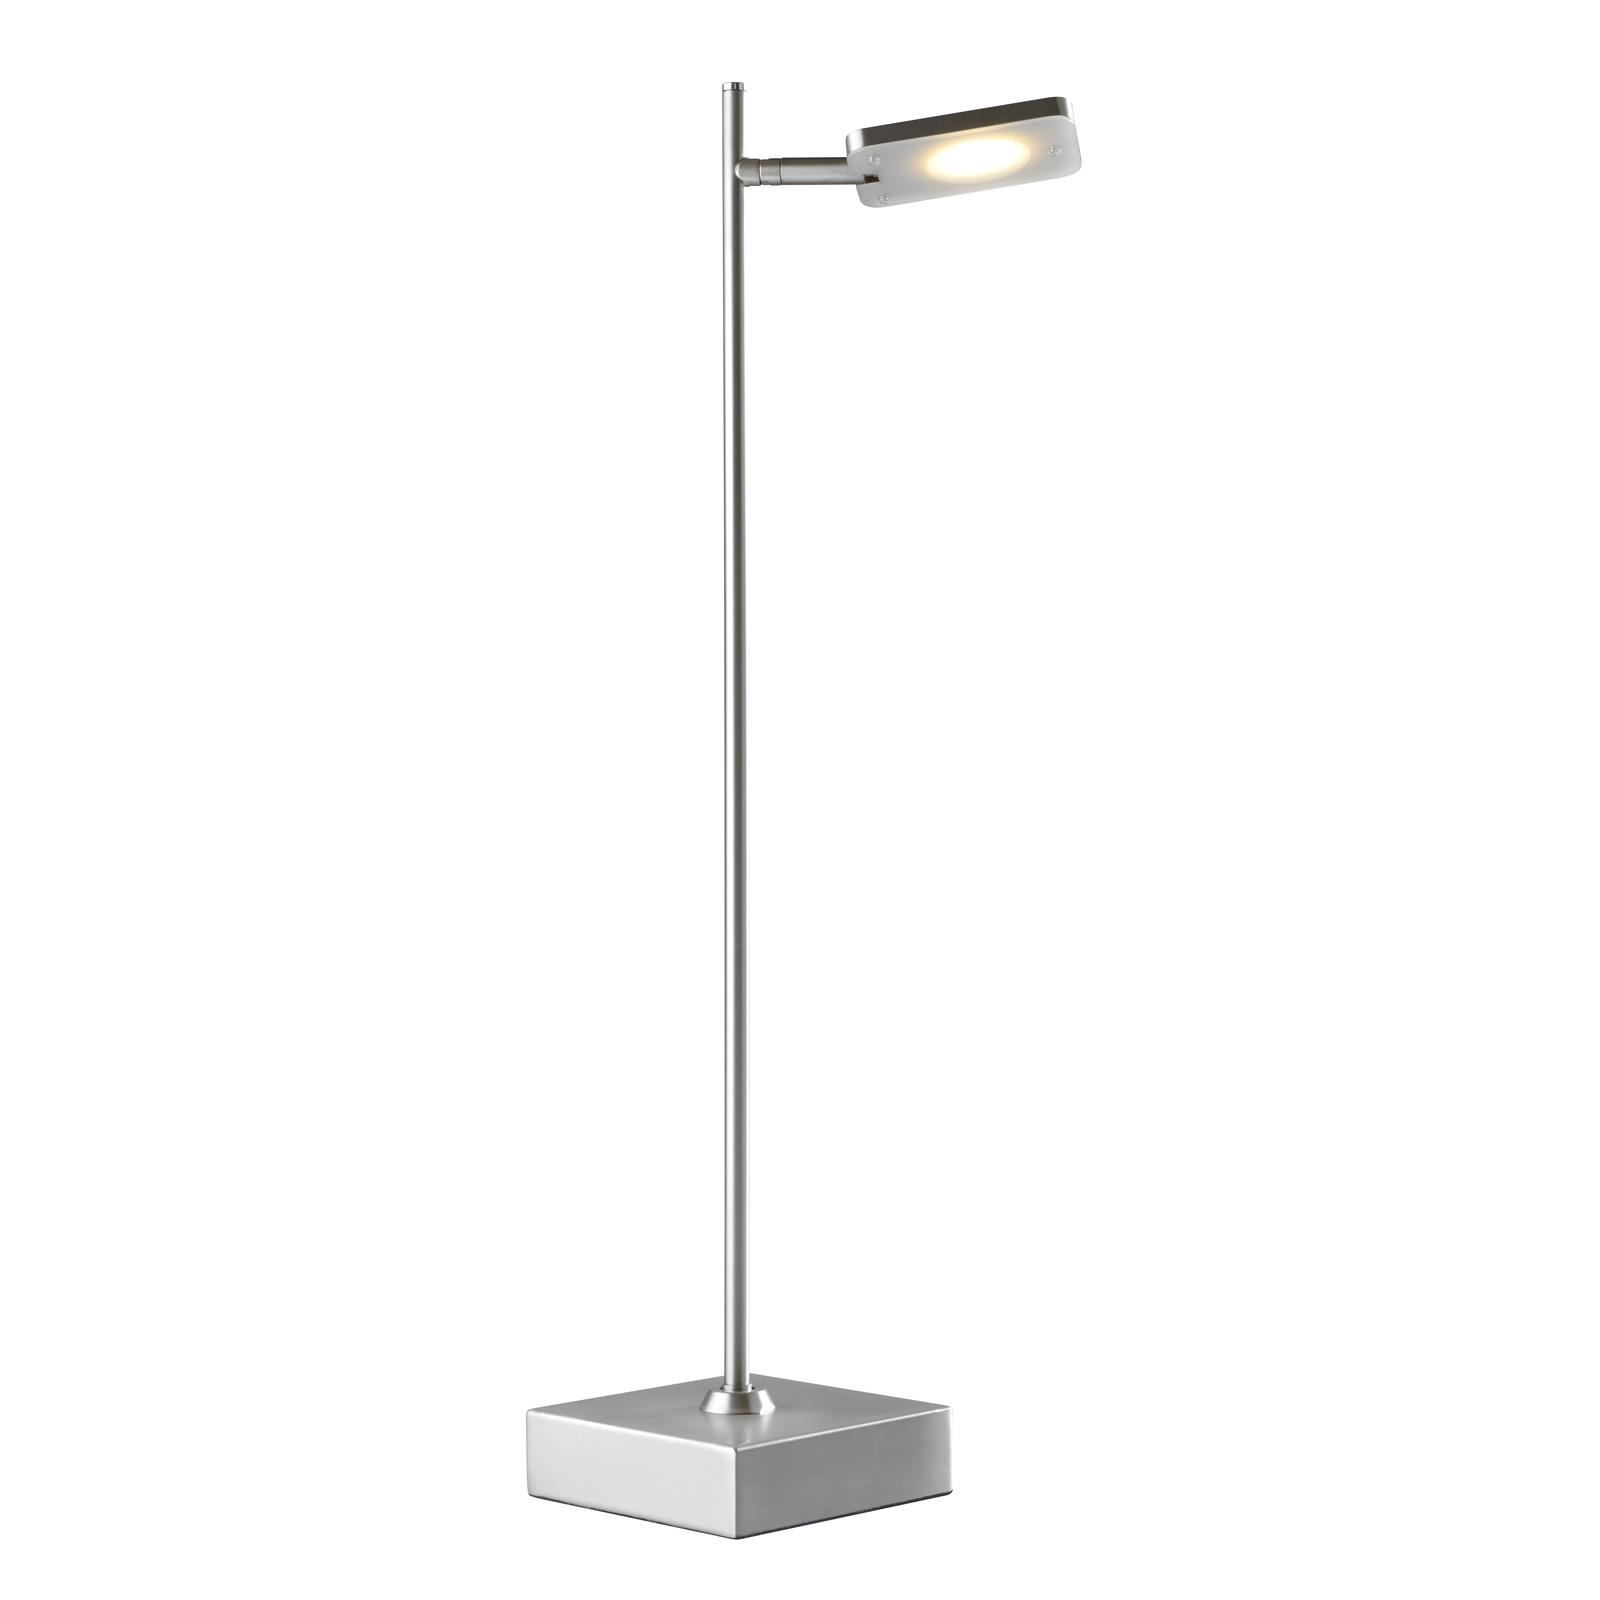 Quad LED-bordlampe, dæmper, 1 lyskilde, alu